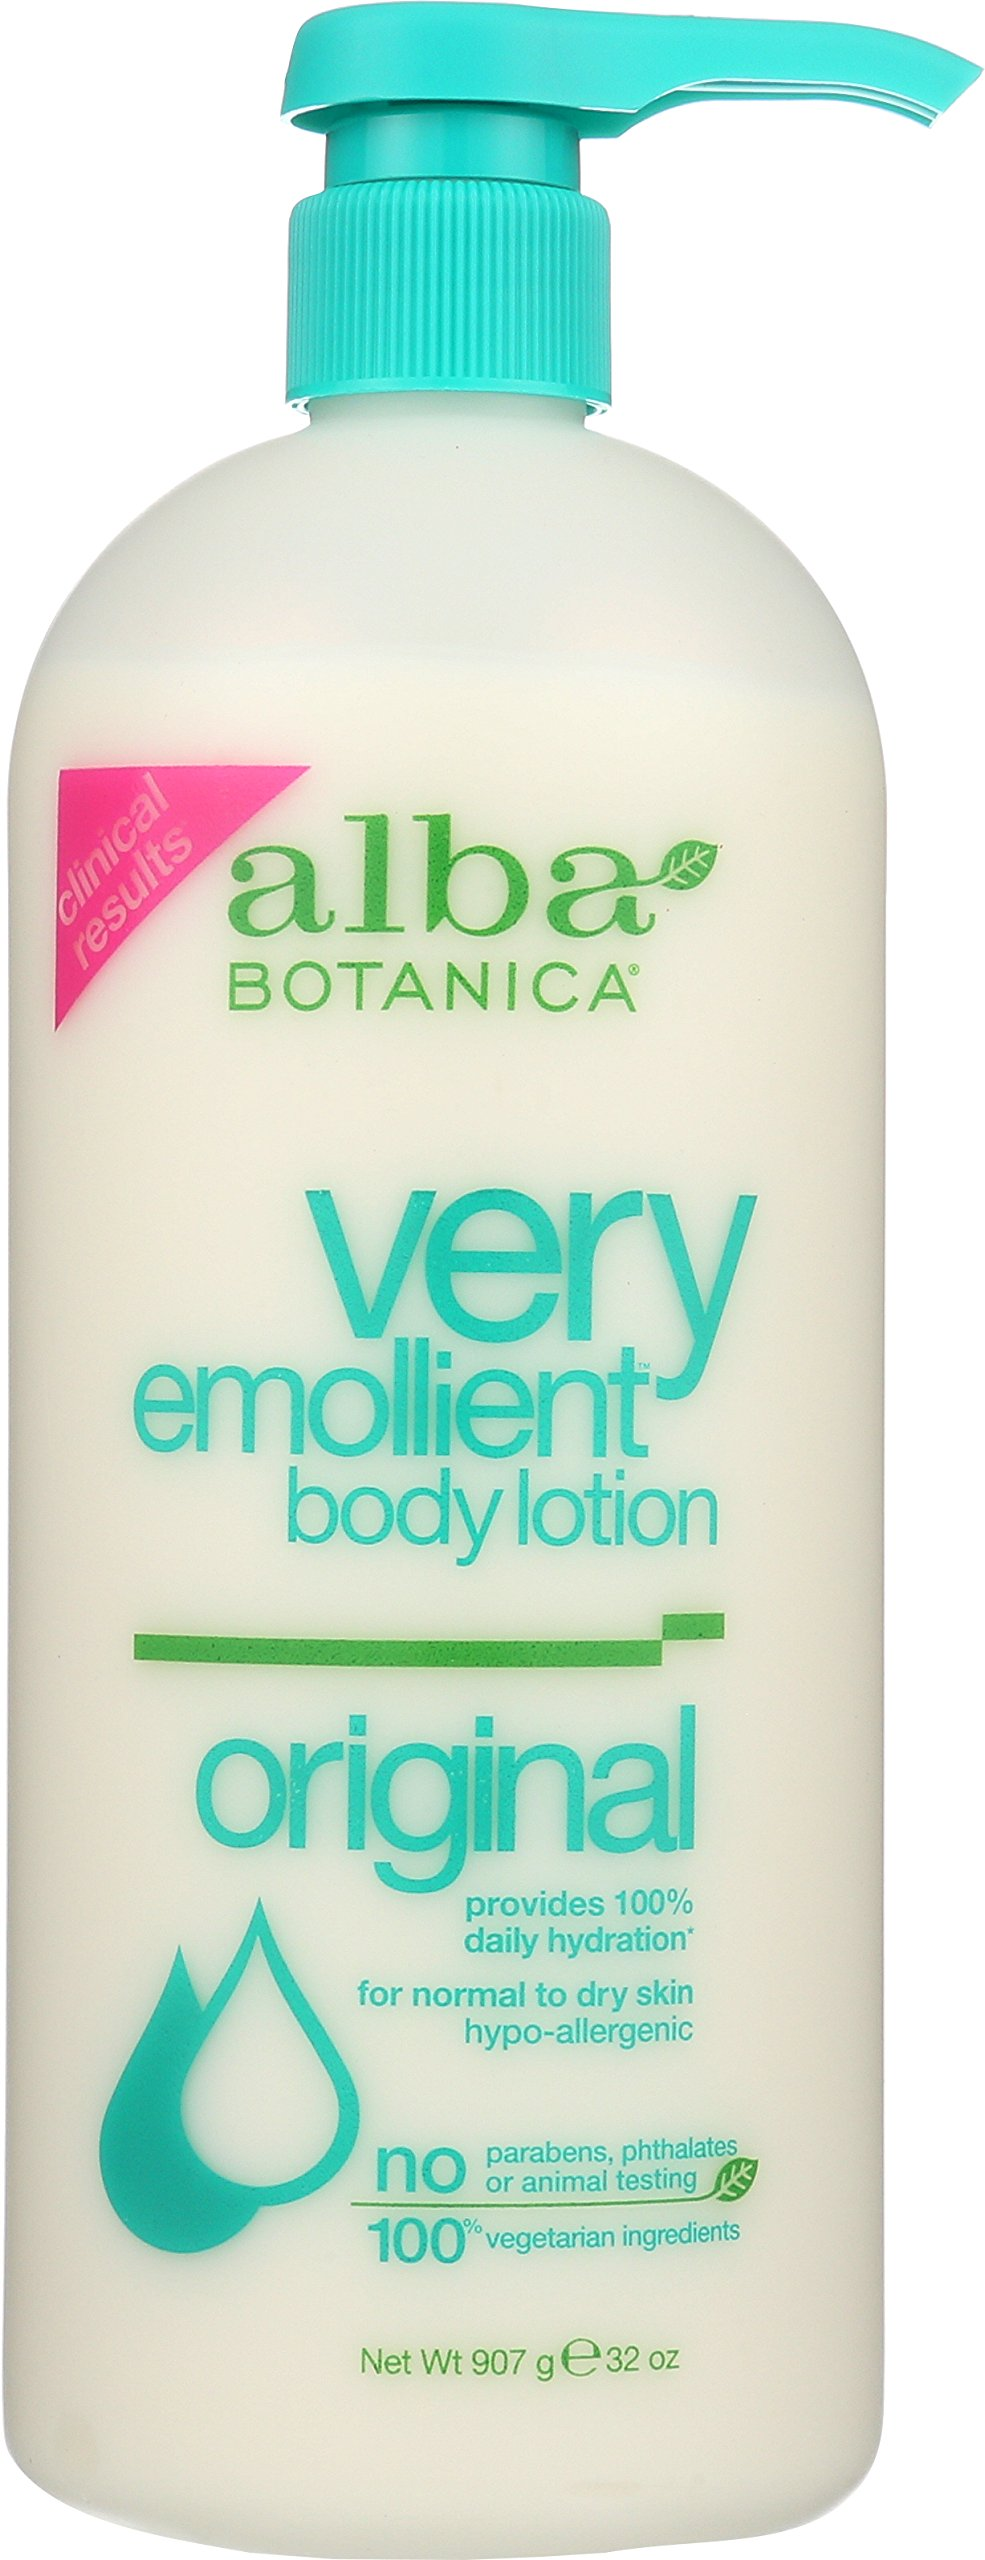 Alba Botanica Very Emollient, Original Body Lotion, 32 Ounce